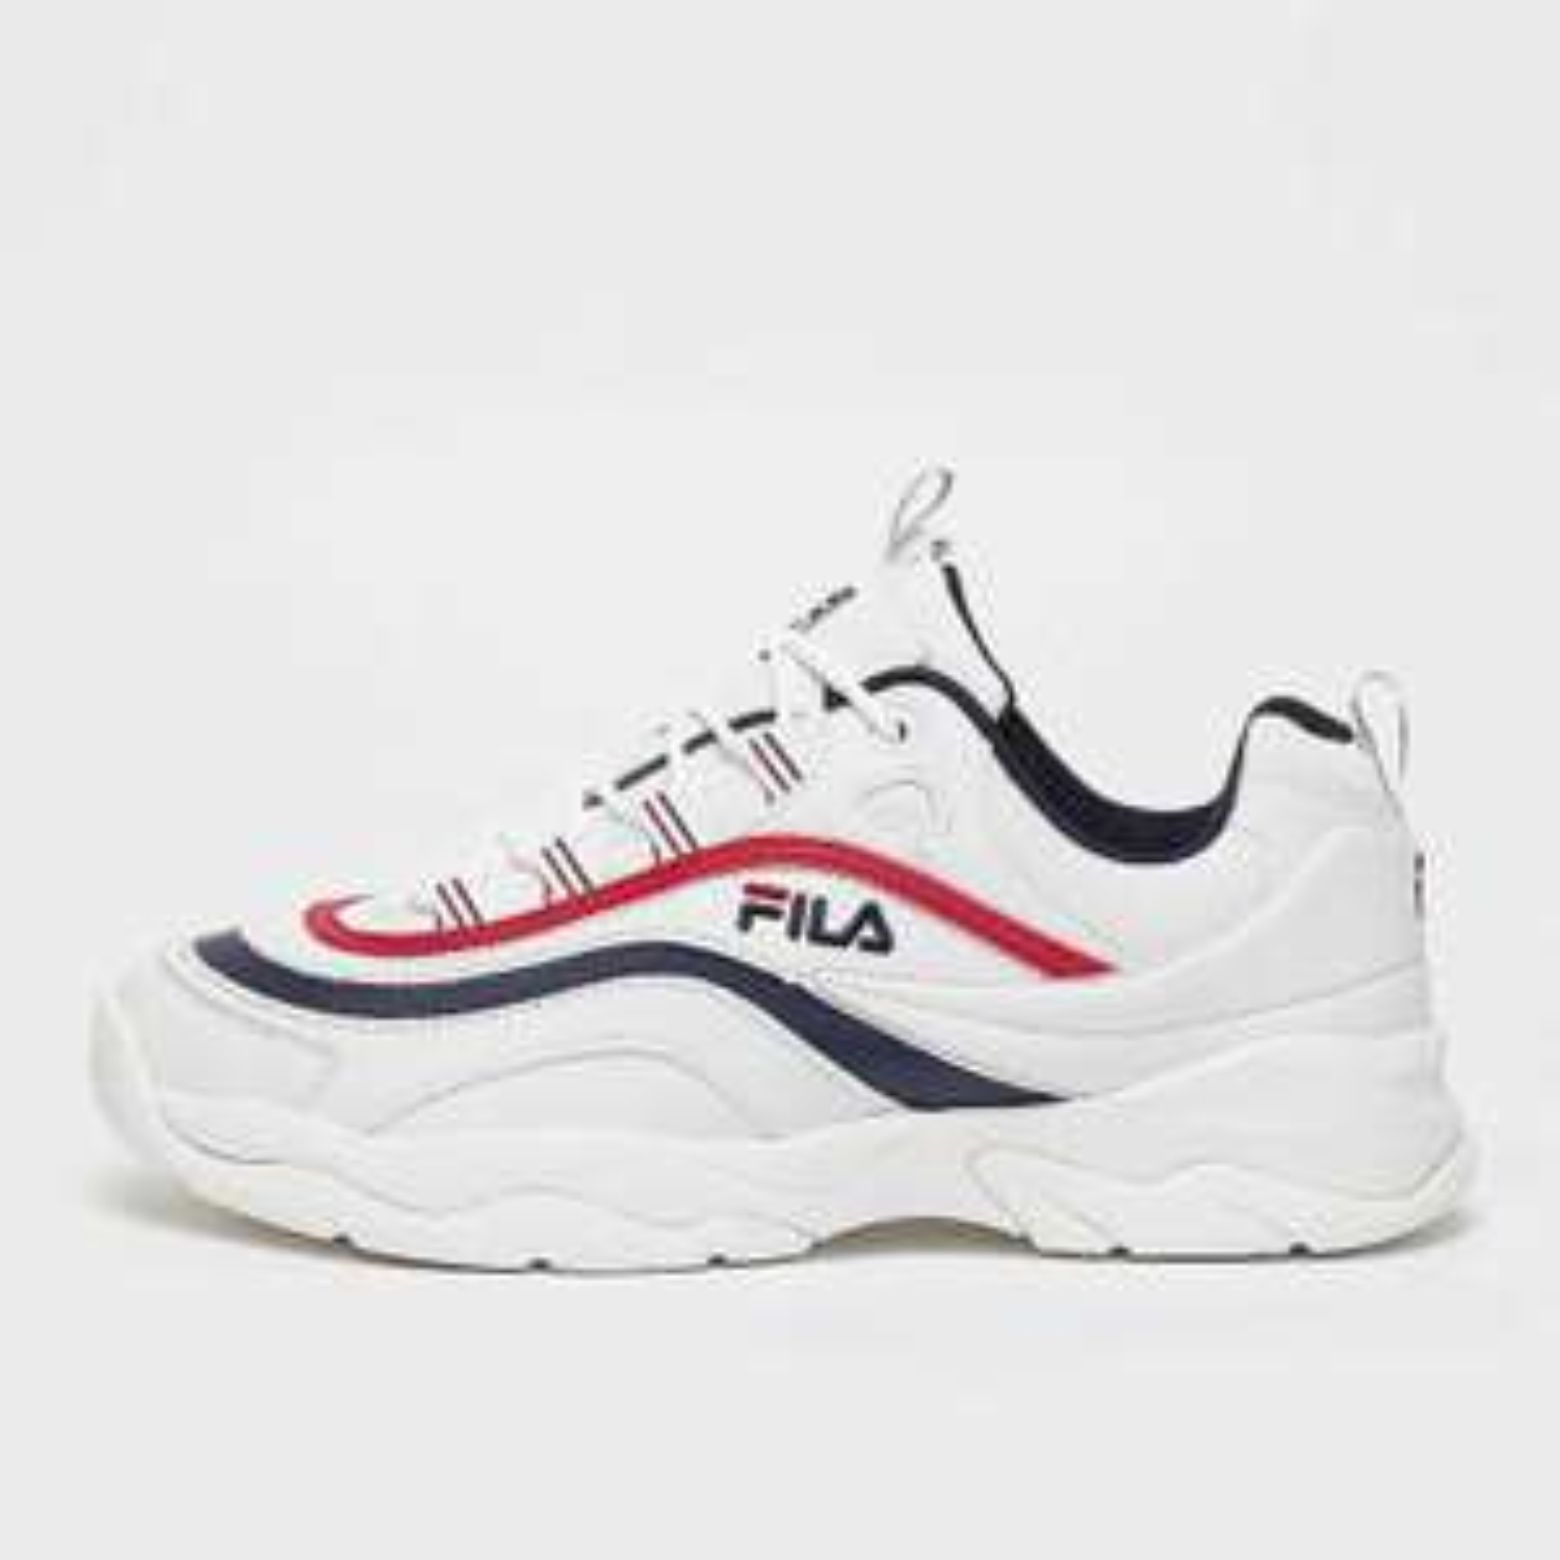 [Snipes] Fila Ray Low - Chunky Sneakers in den Größen 45 und 46